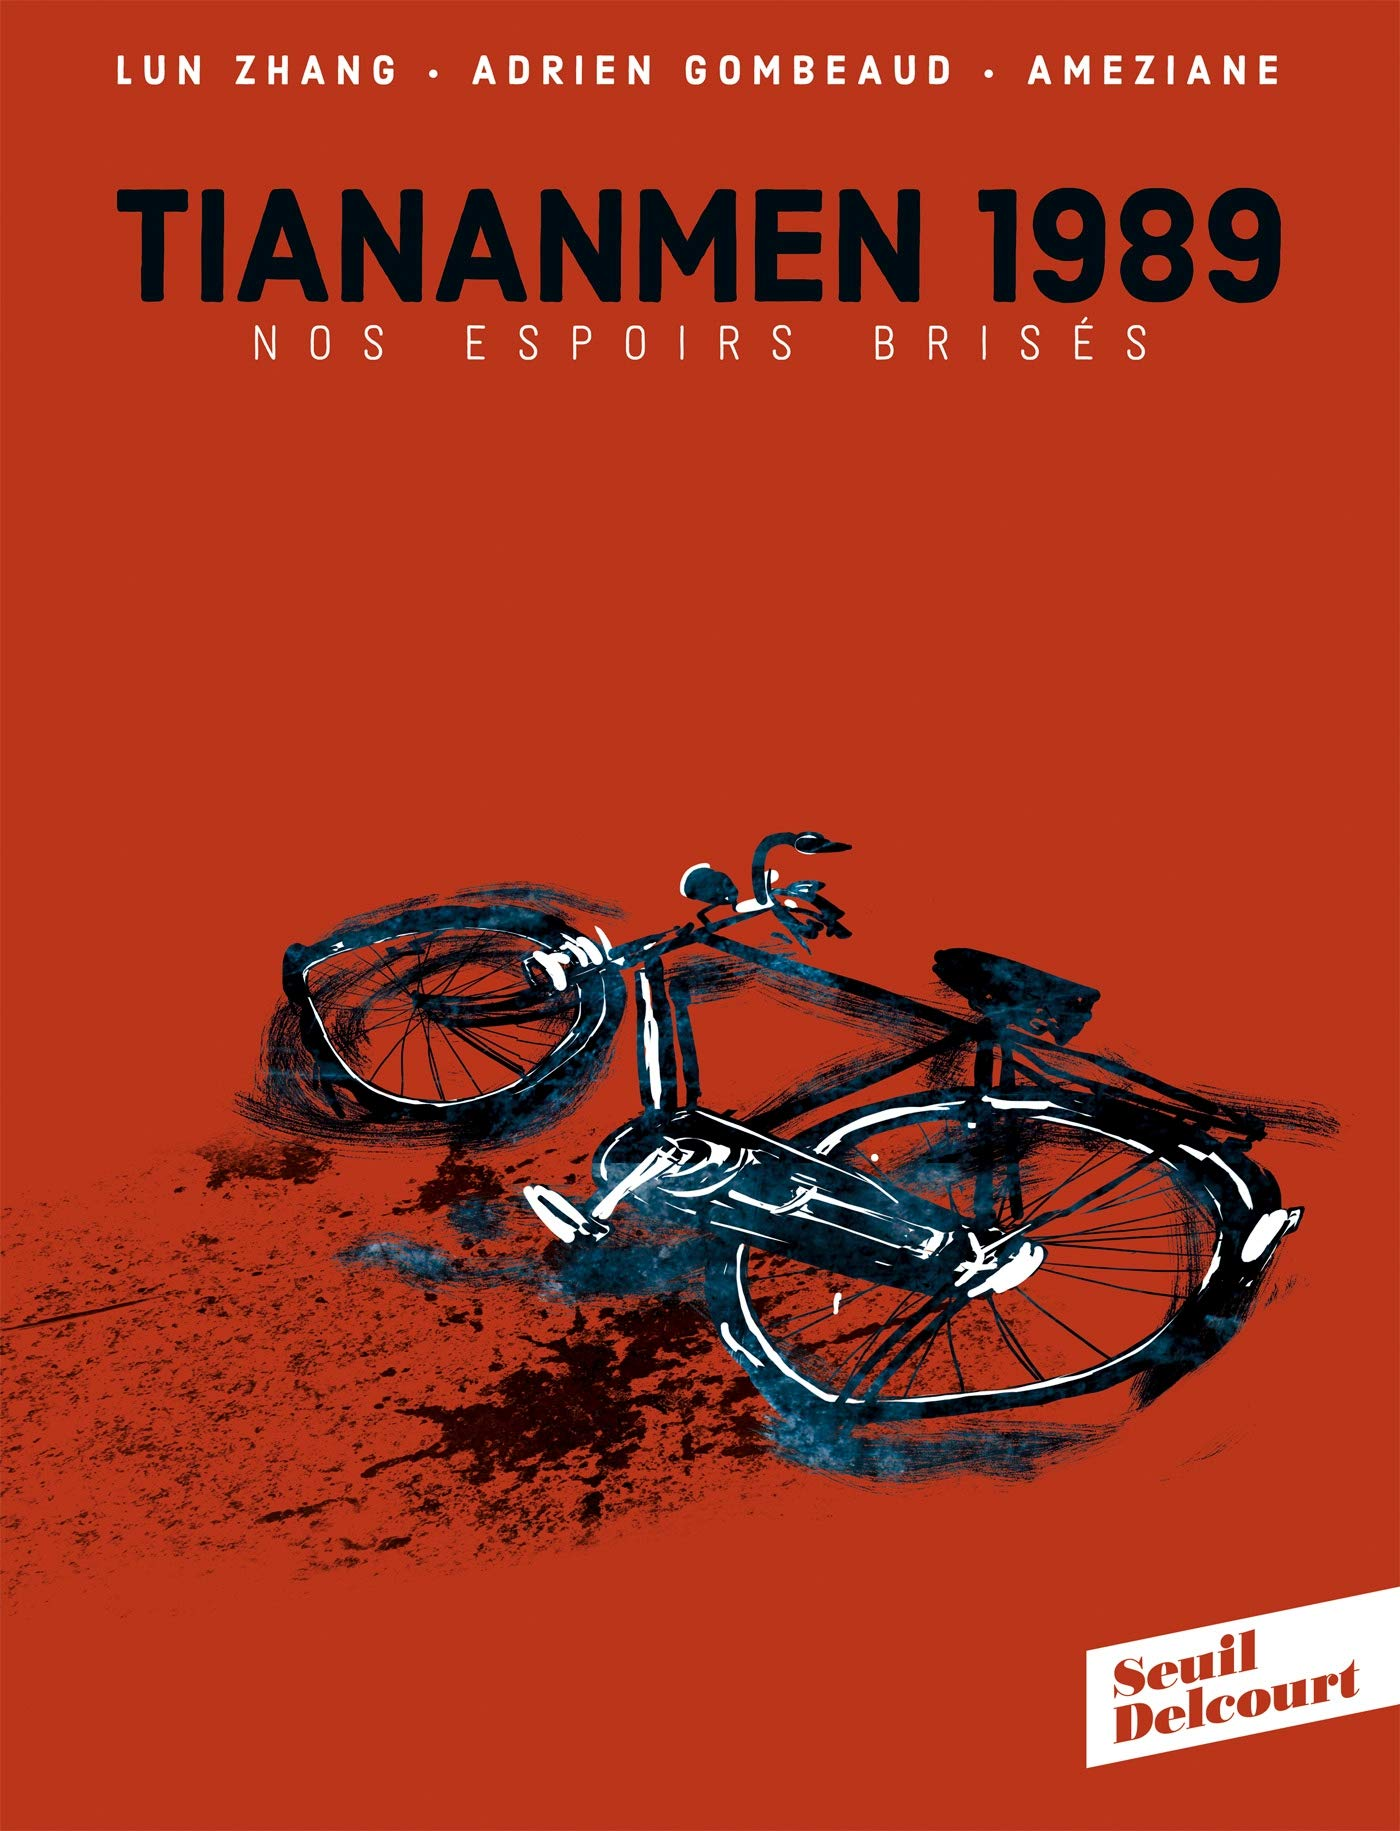 TianAnMen 1989 1 - Nos espoirs brisés